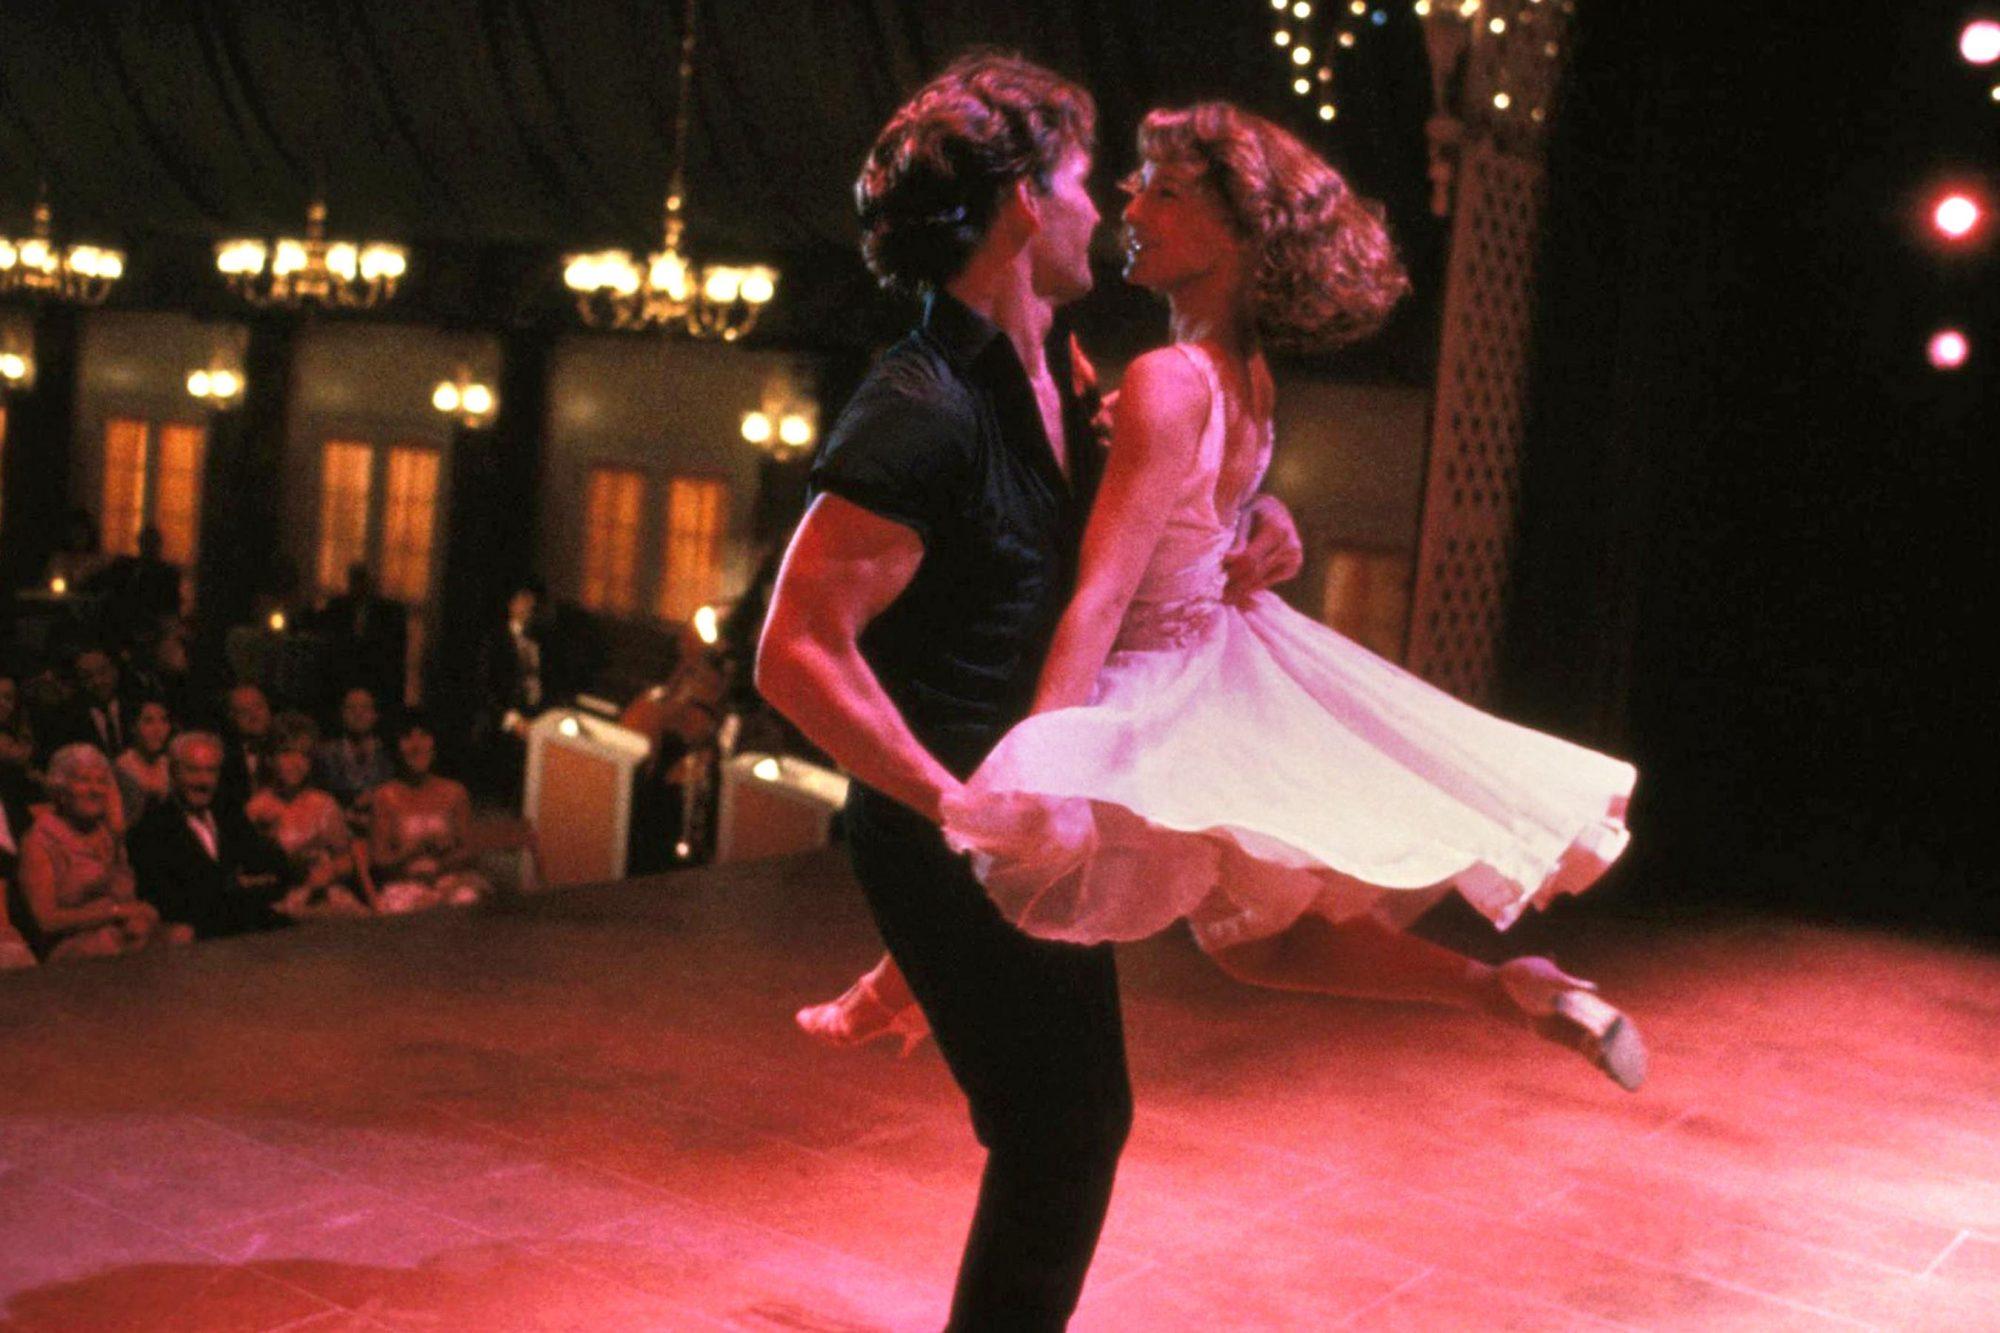 DIRTY DANCING, Patrick Swayze, Jennifer Grey, 1987, ©Vestron Pictures/courtesy Everett Collection